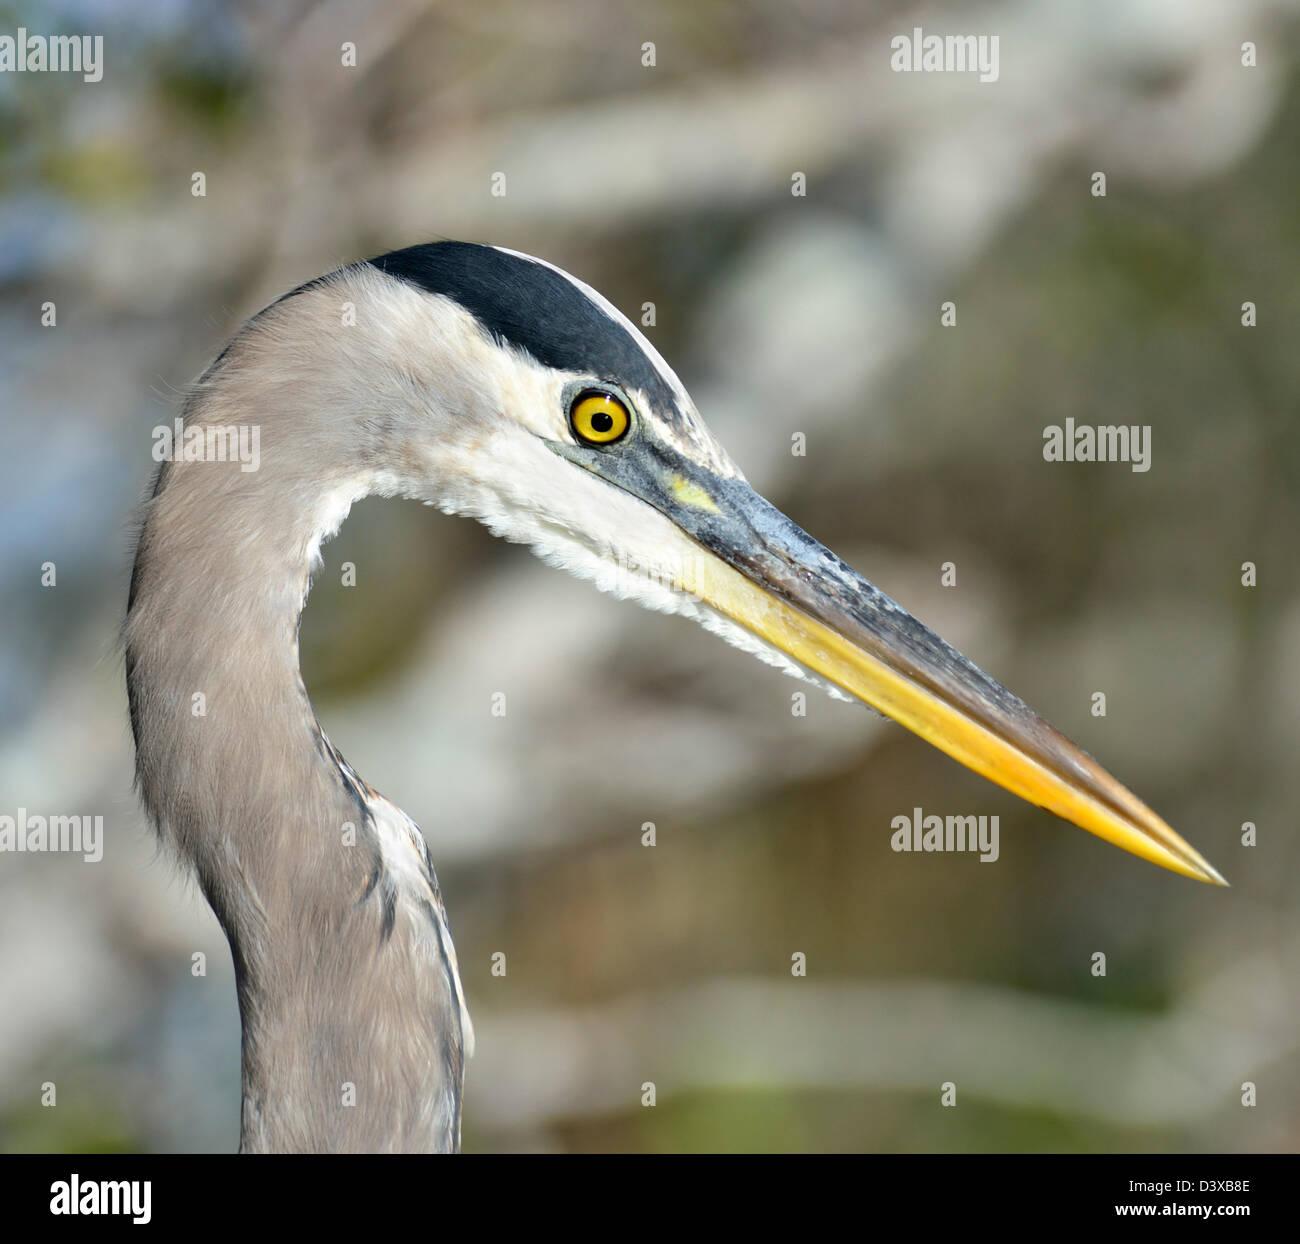 A Great Blue Heron Portrait - Stock Image